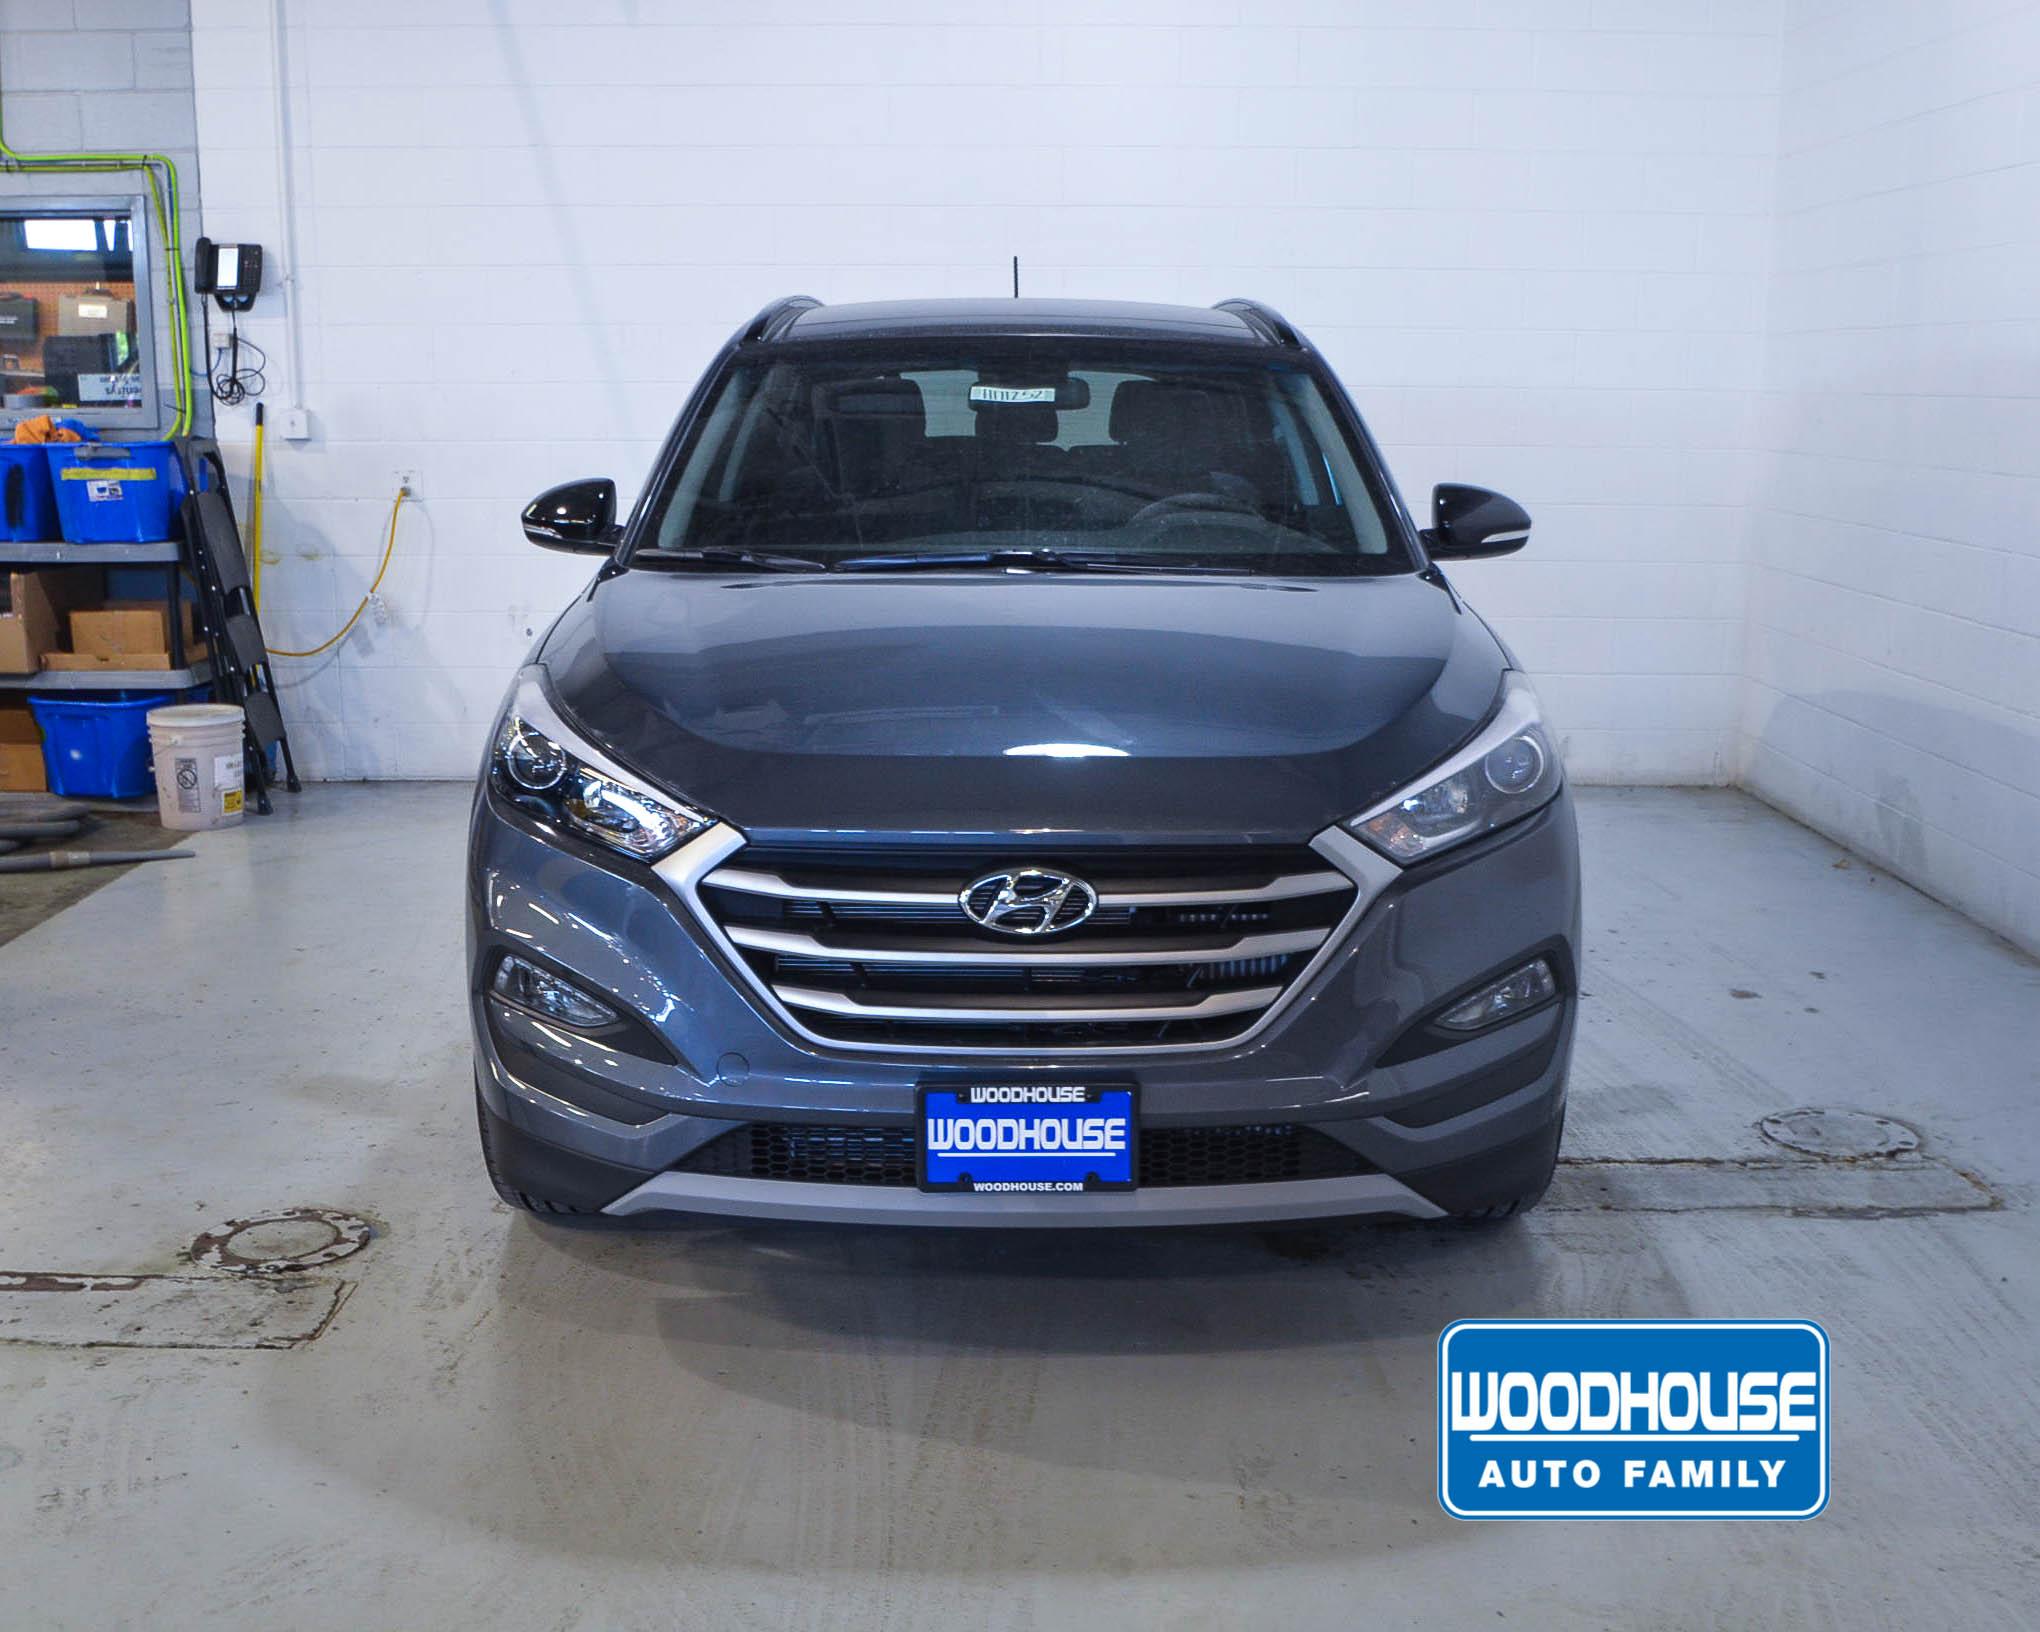 Hyundai Tucson For Sale Woodhouse Auto